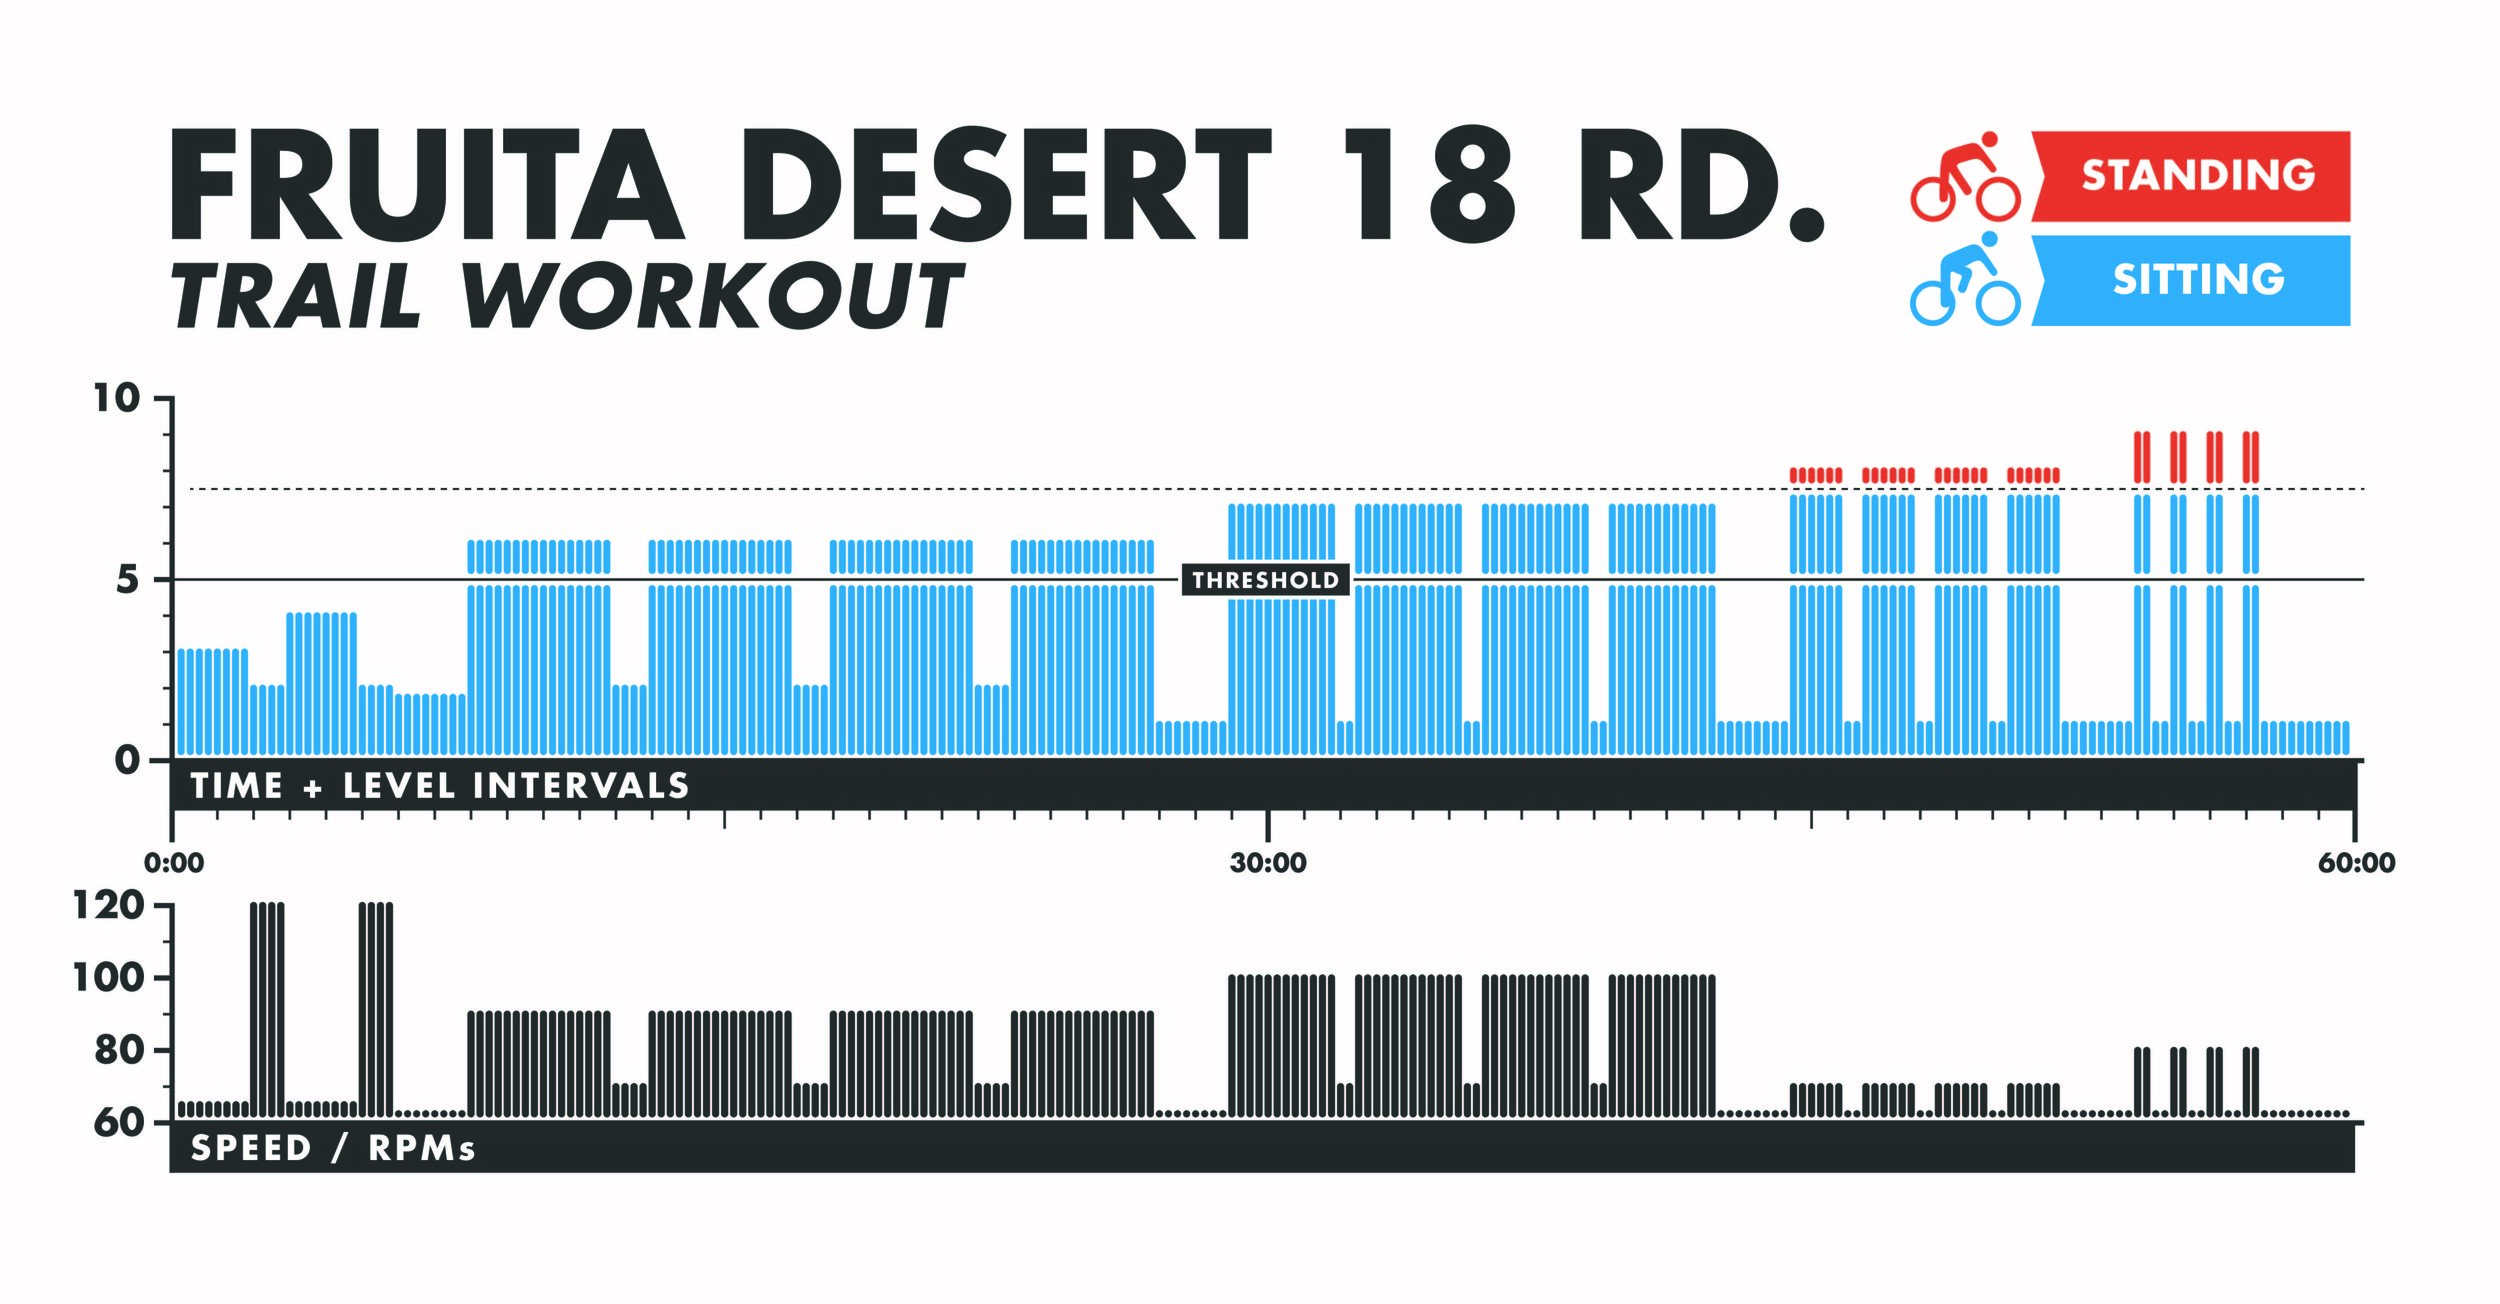 18Rd-TRAIL Info-Graphic.jpg